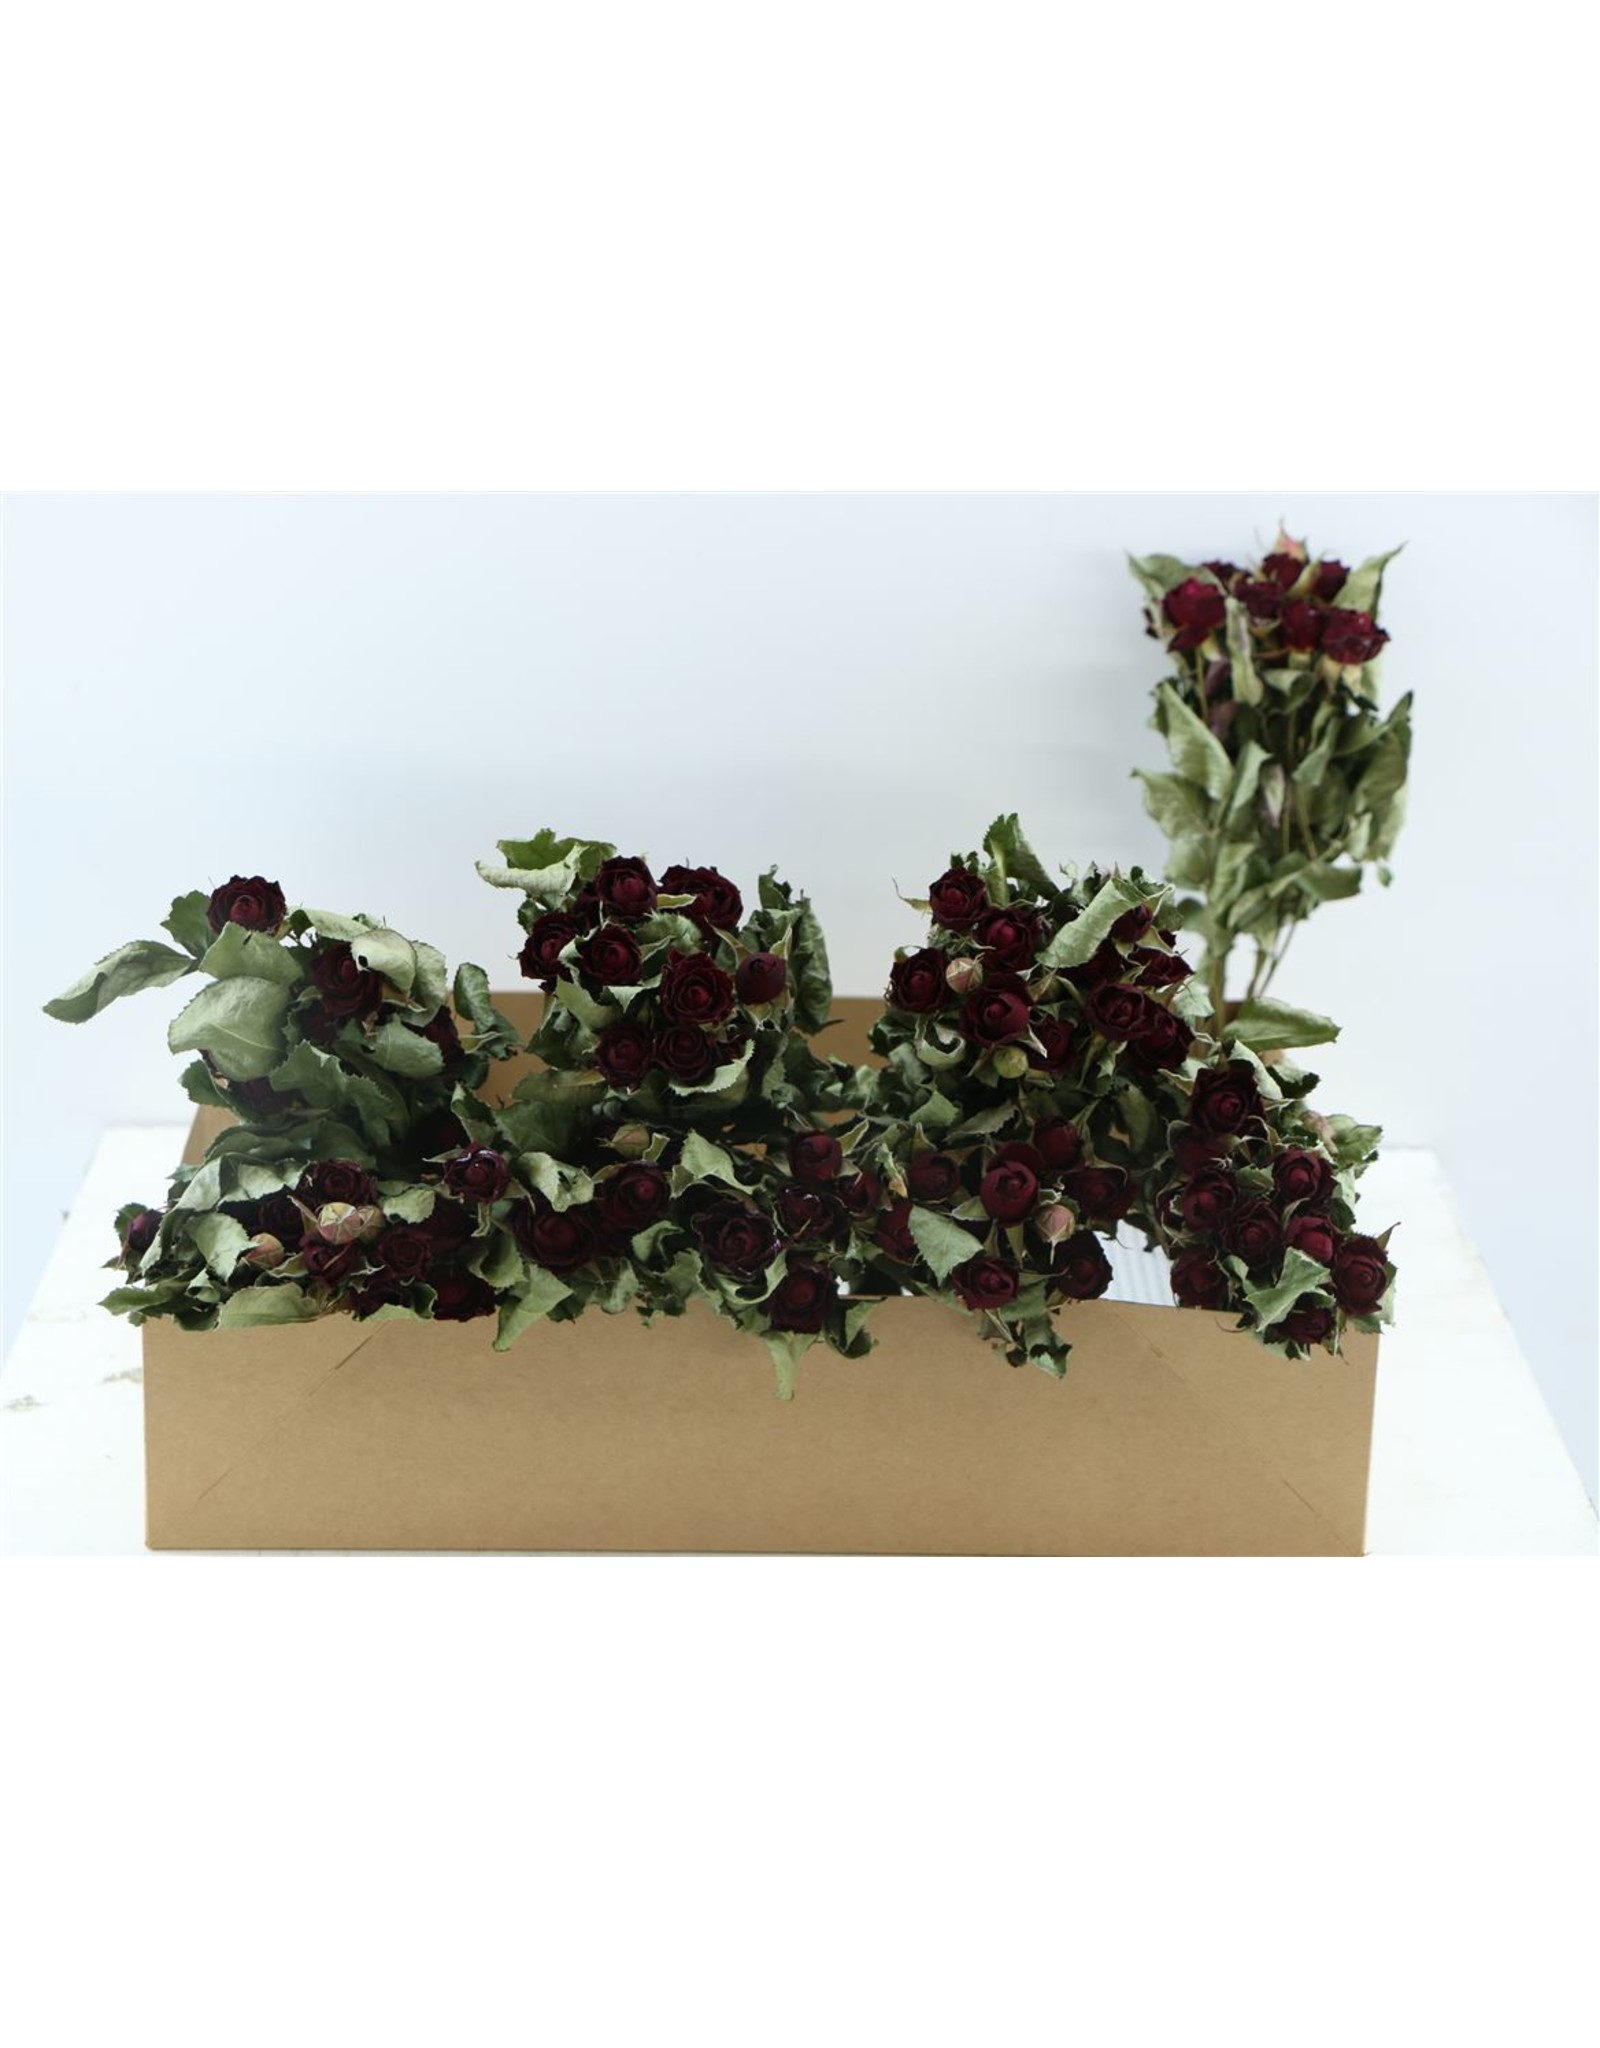 GF Dried Roses Spray Burgundy 10pcs Sc x 2